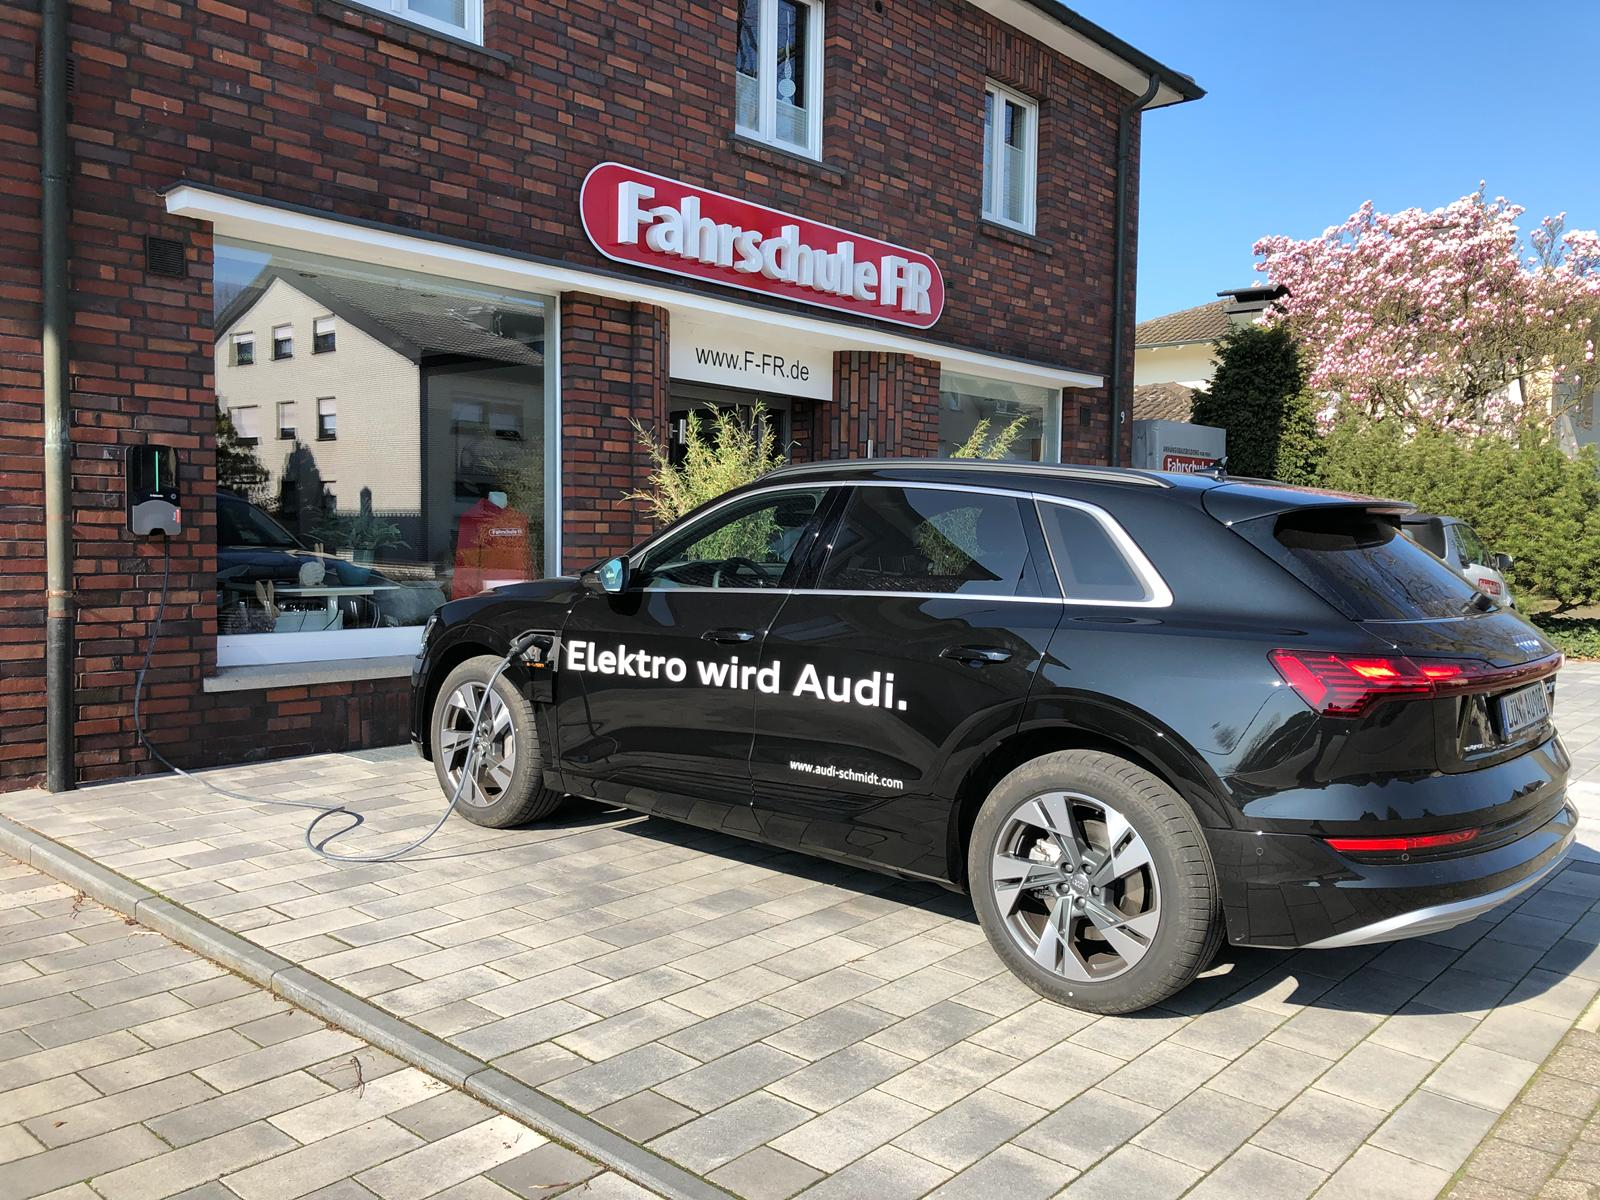 Probefahrt -> Audi e-tron